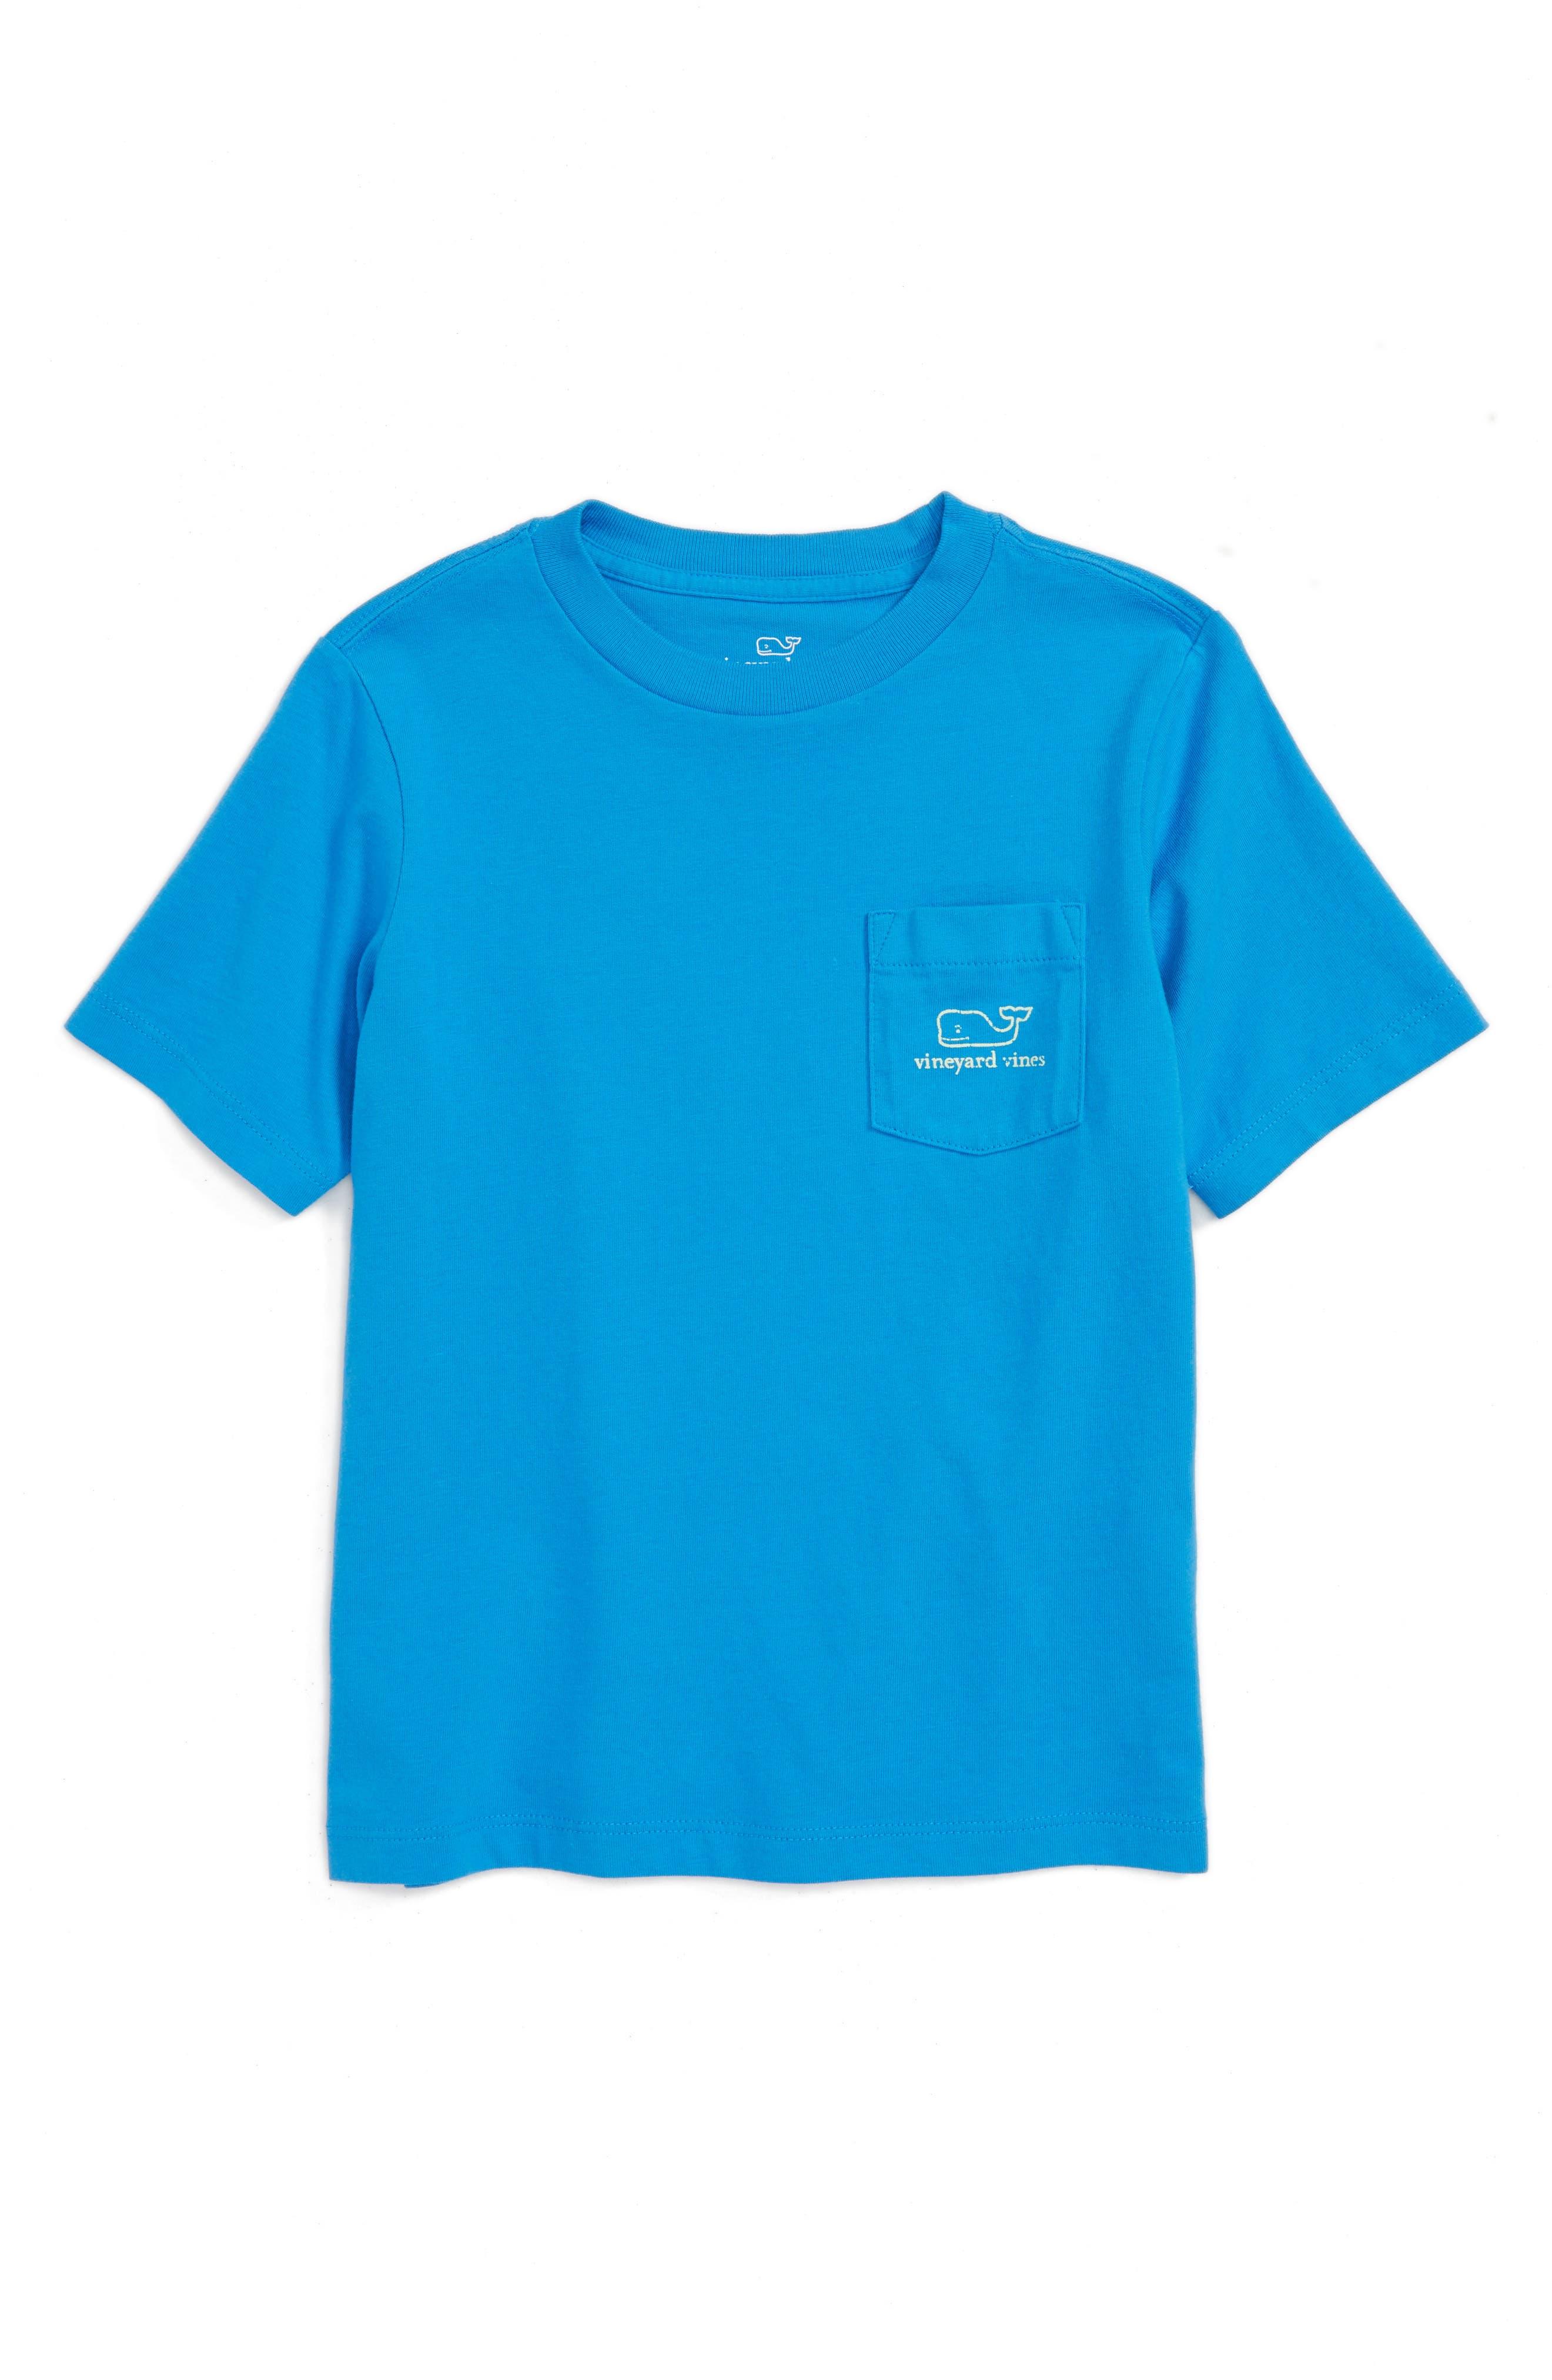 Alternate Image 1 Selected - Vineyard Vines 'Vintage Whale' Pocket T-Shirt (Toddler Boys & Little Boys)